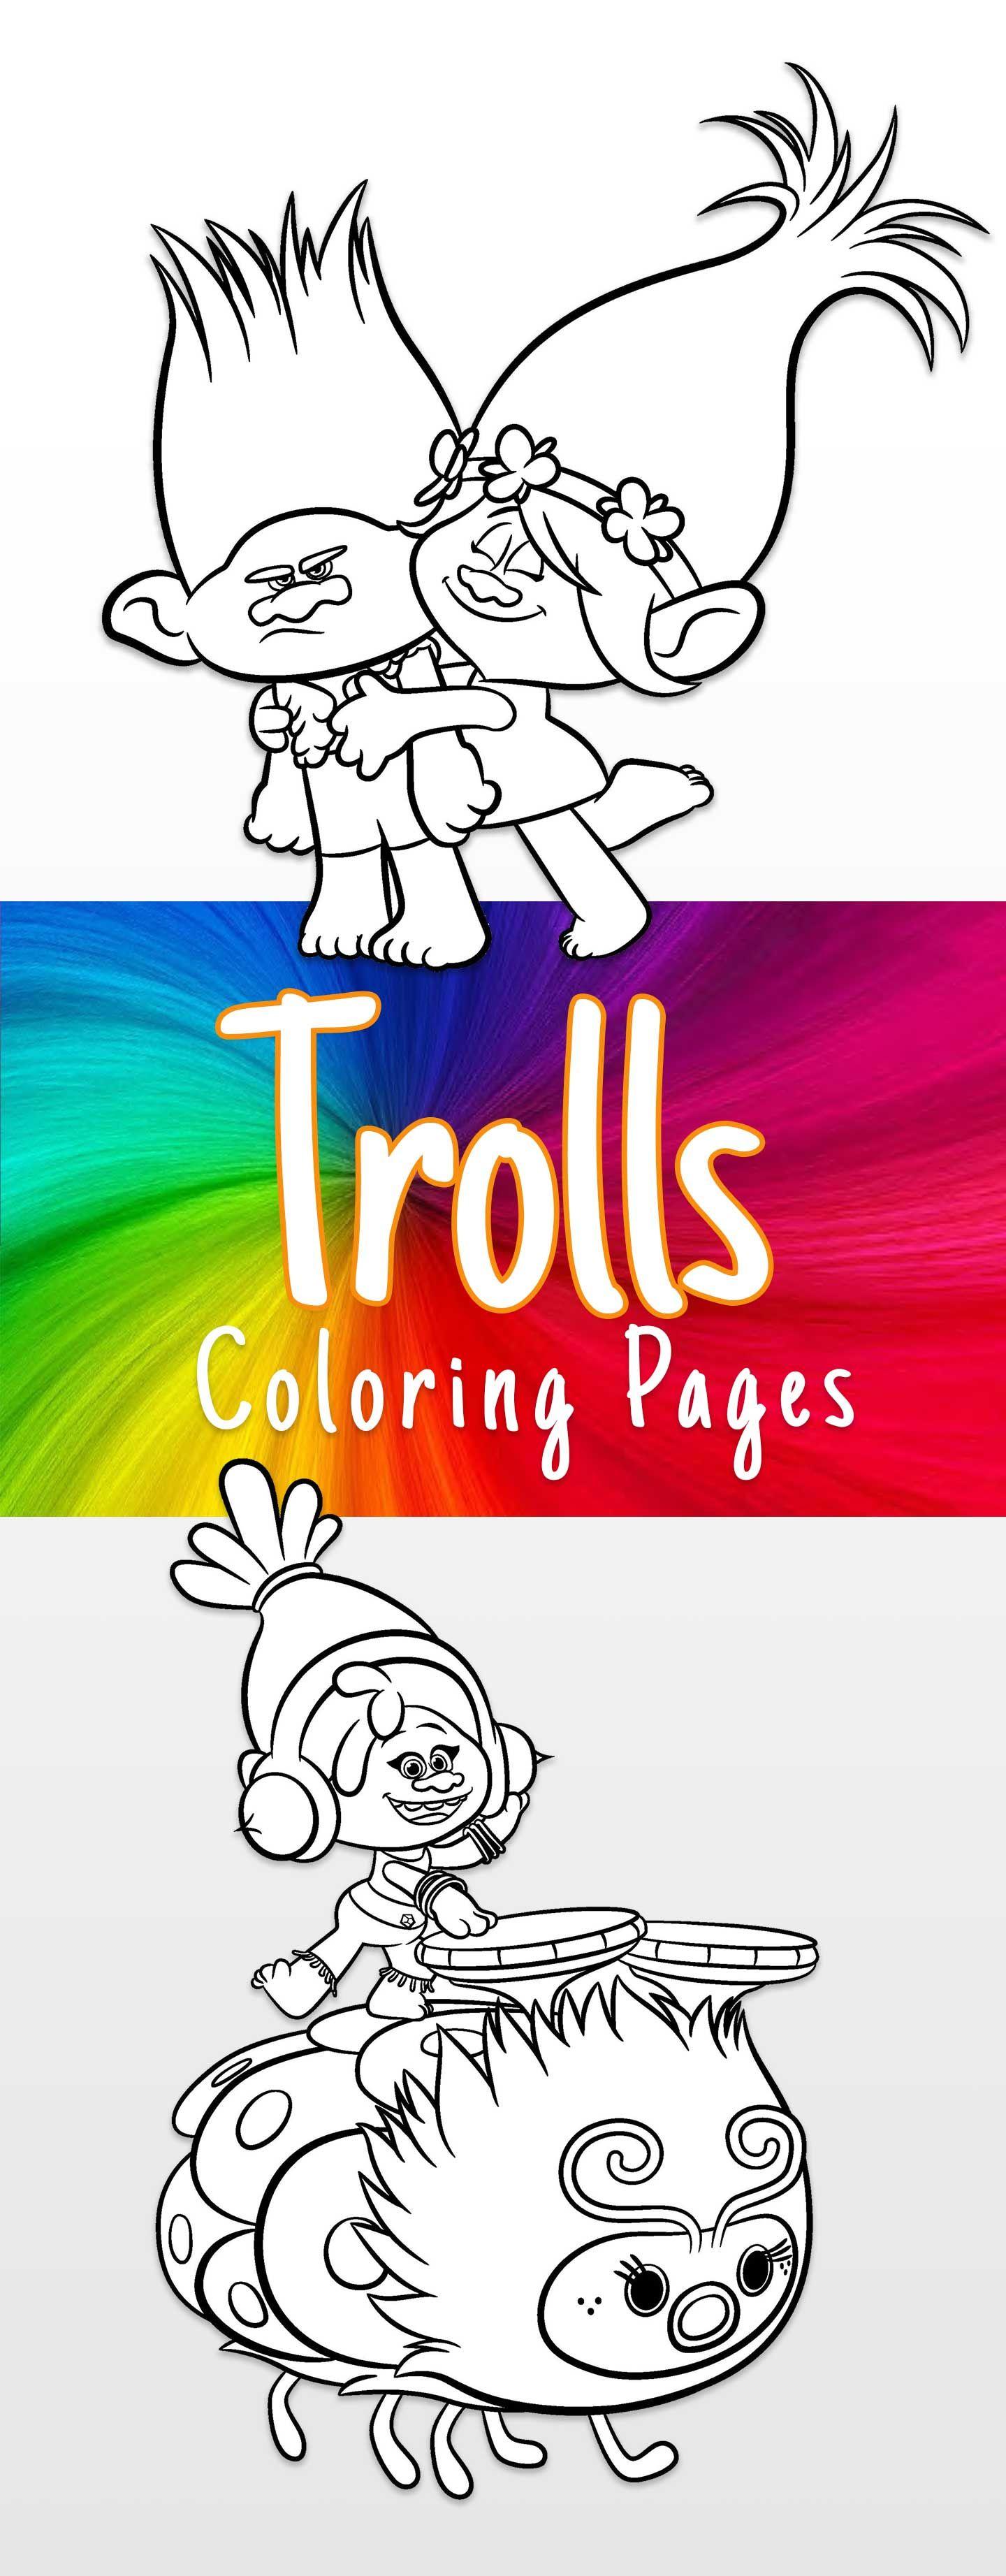 Trolls coloring sheets and printable activity sheets